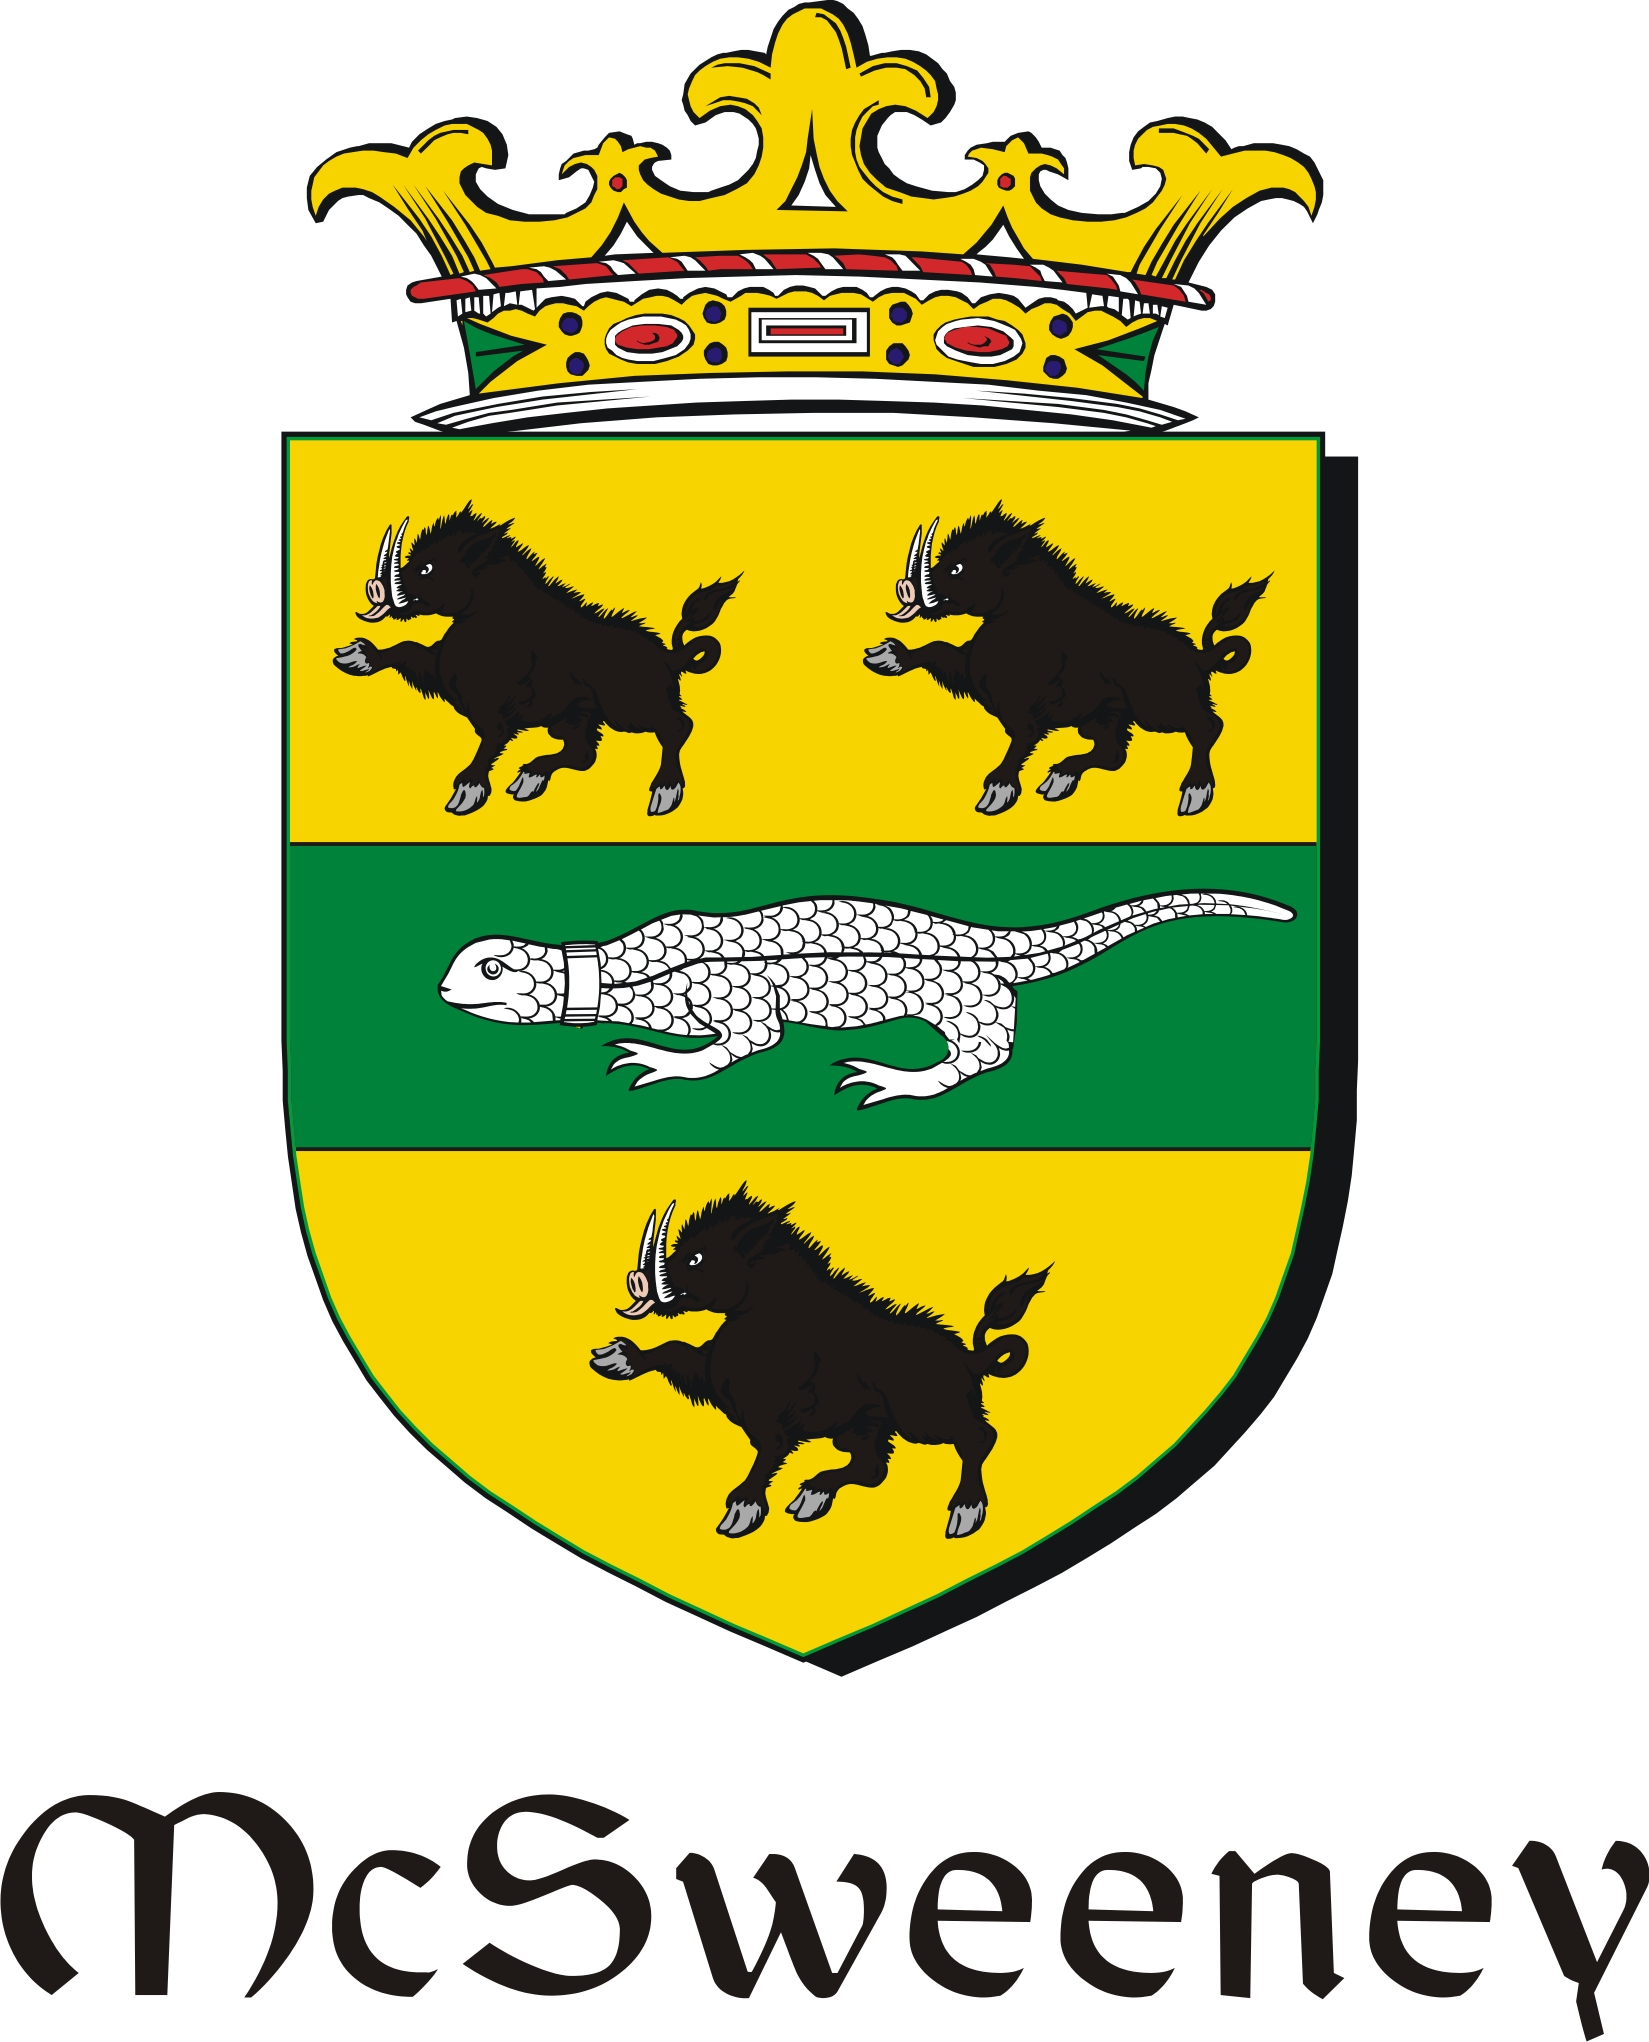 Sweeney mc family crest irish coat of arms image download downl pay for sweeney mc family crest irish coat of arms image download thecheapjerseys Gallery